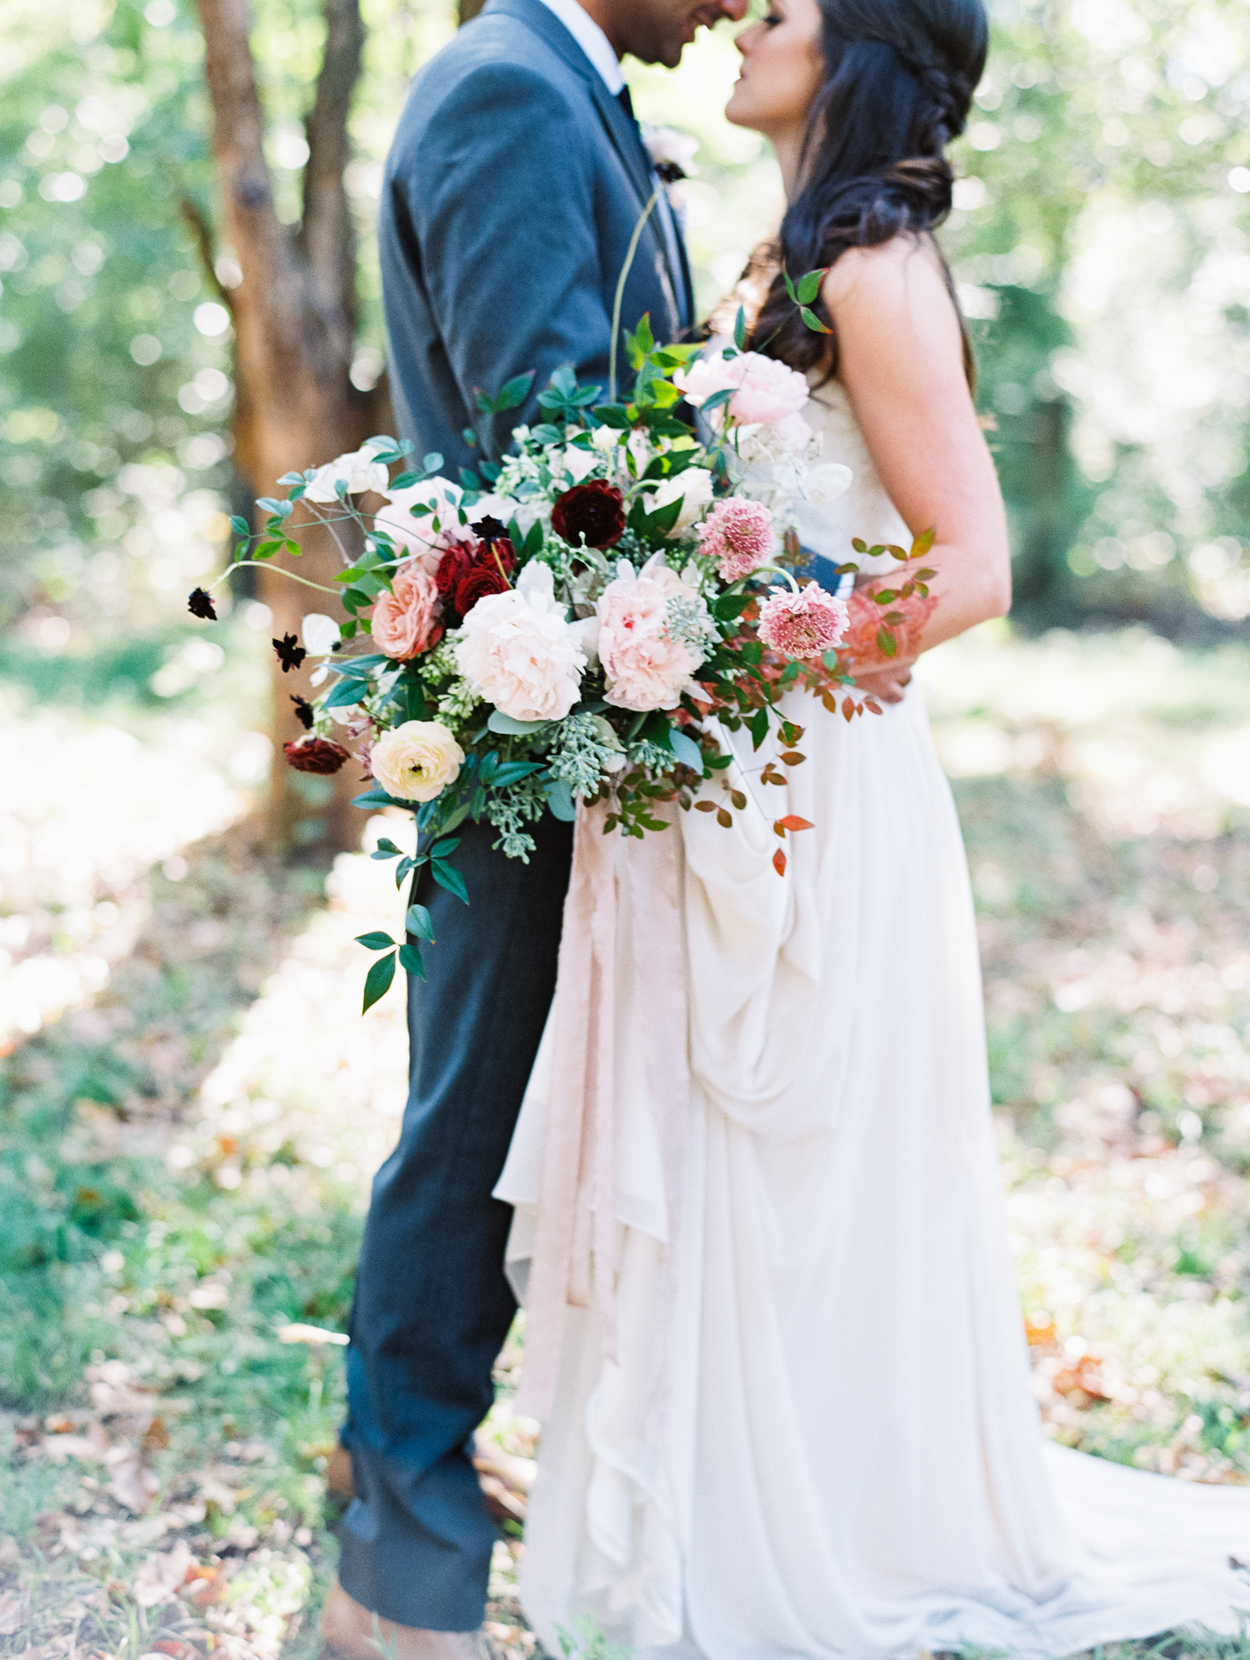 Dallas Wedding Planner and Designer Lindsey Zamora